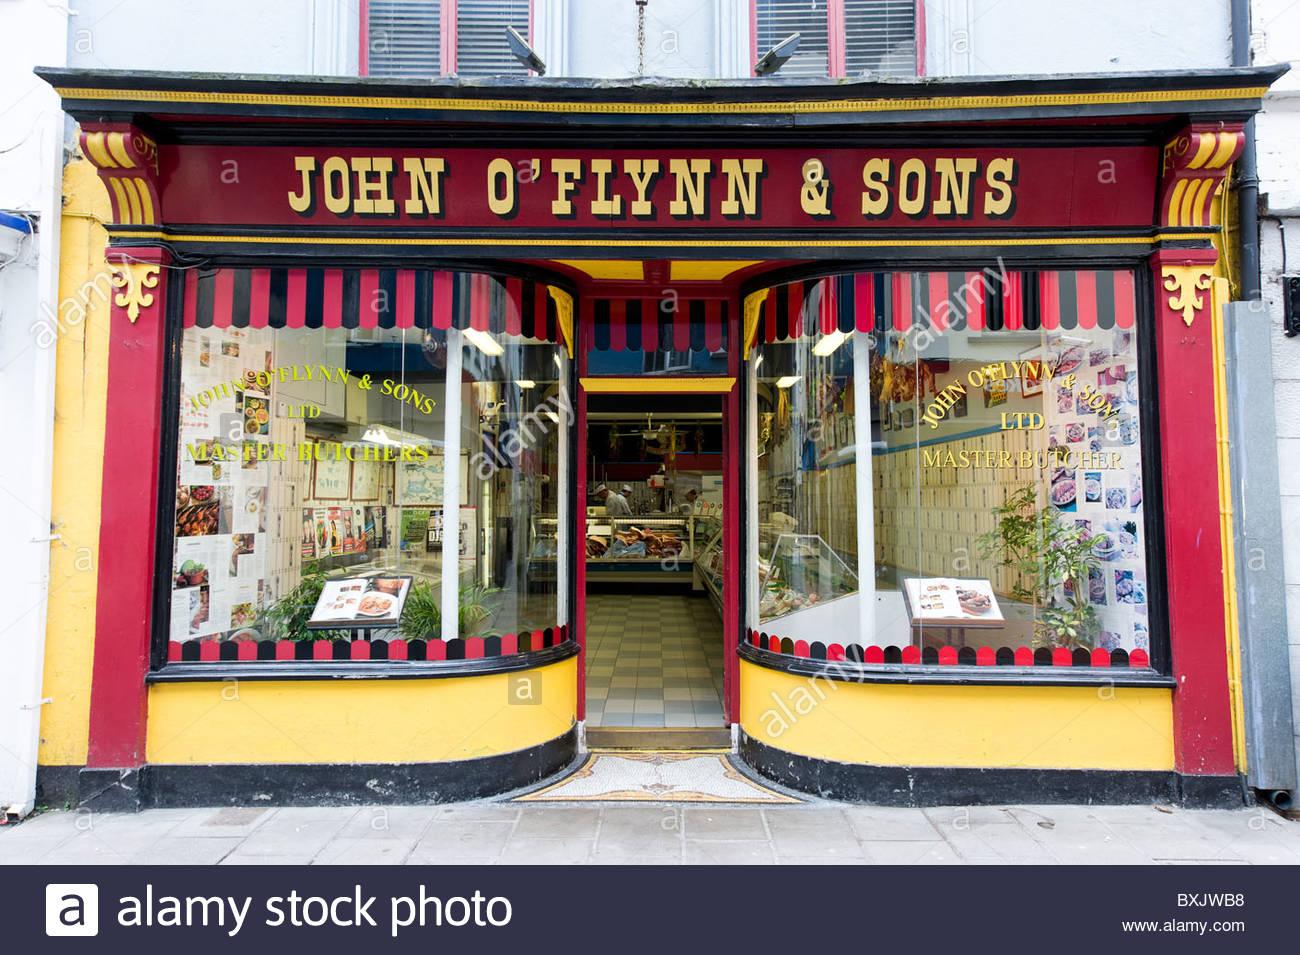 John O'Flynn & Sons traditional butchers shop in Cork, County Cork, Ireland - Stock Image